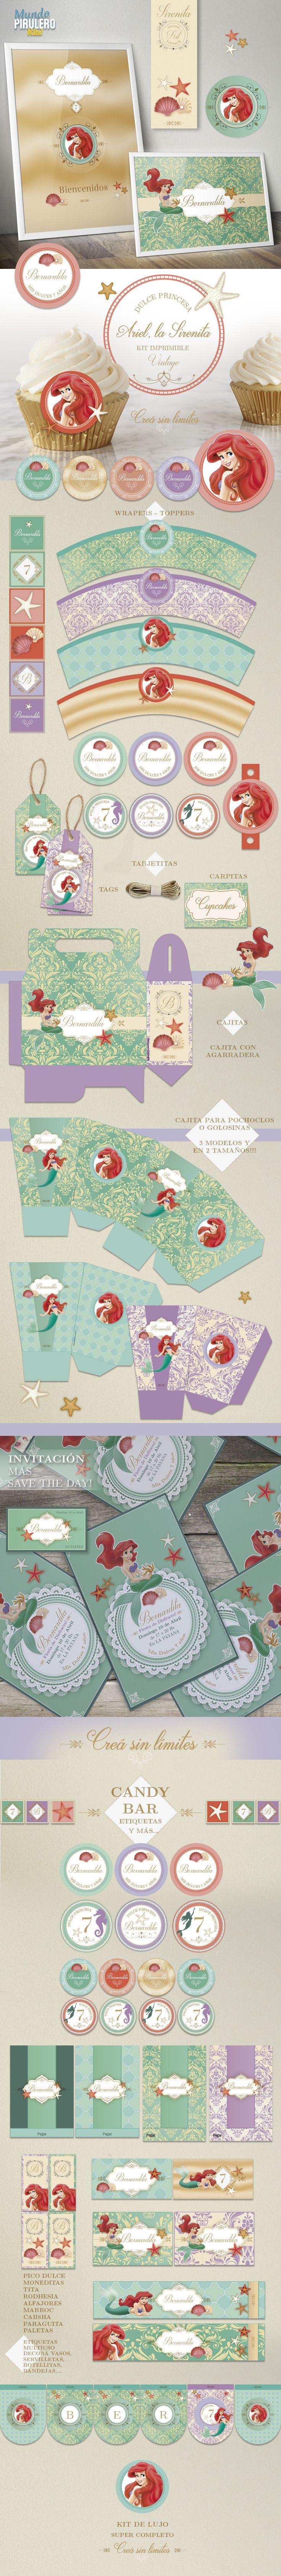 Kit imprmible La Sirenita Princesa Ariel #TheLittleMermaid #printable #printableTheLittleMermaid #SirenitaAriel #princesaAriel #partyPrintableSirenitaAriel                                                                                                                                                                                 Más